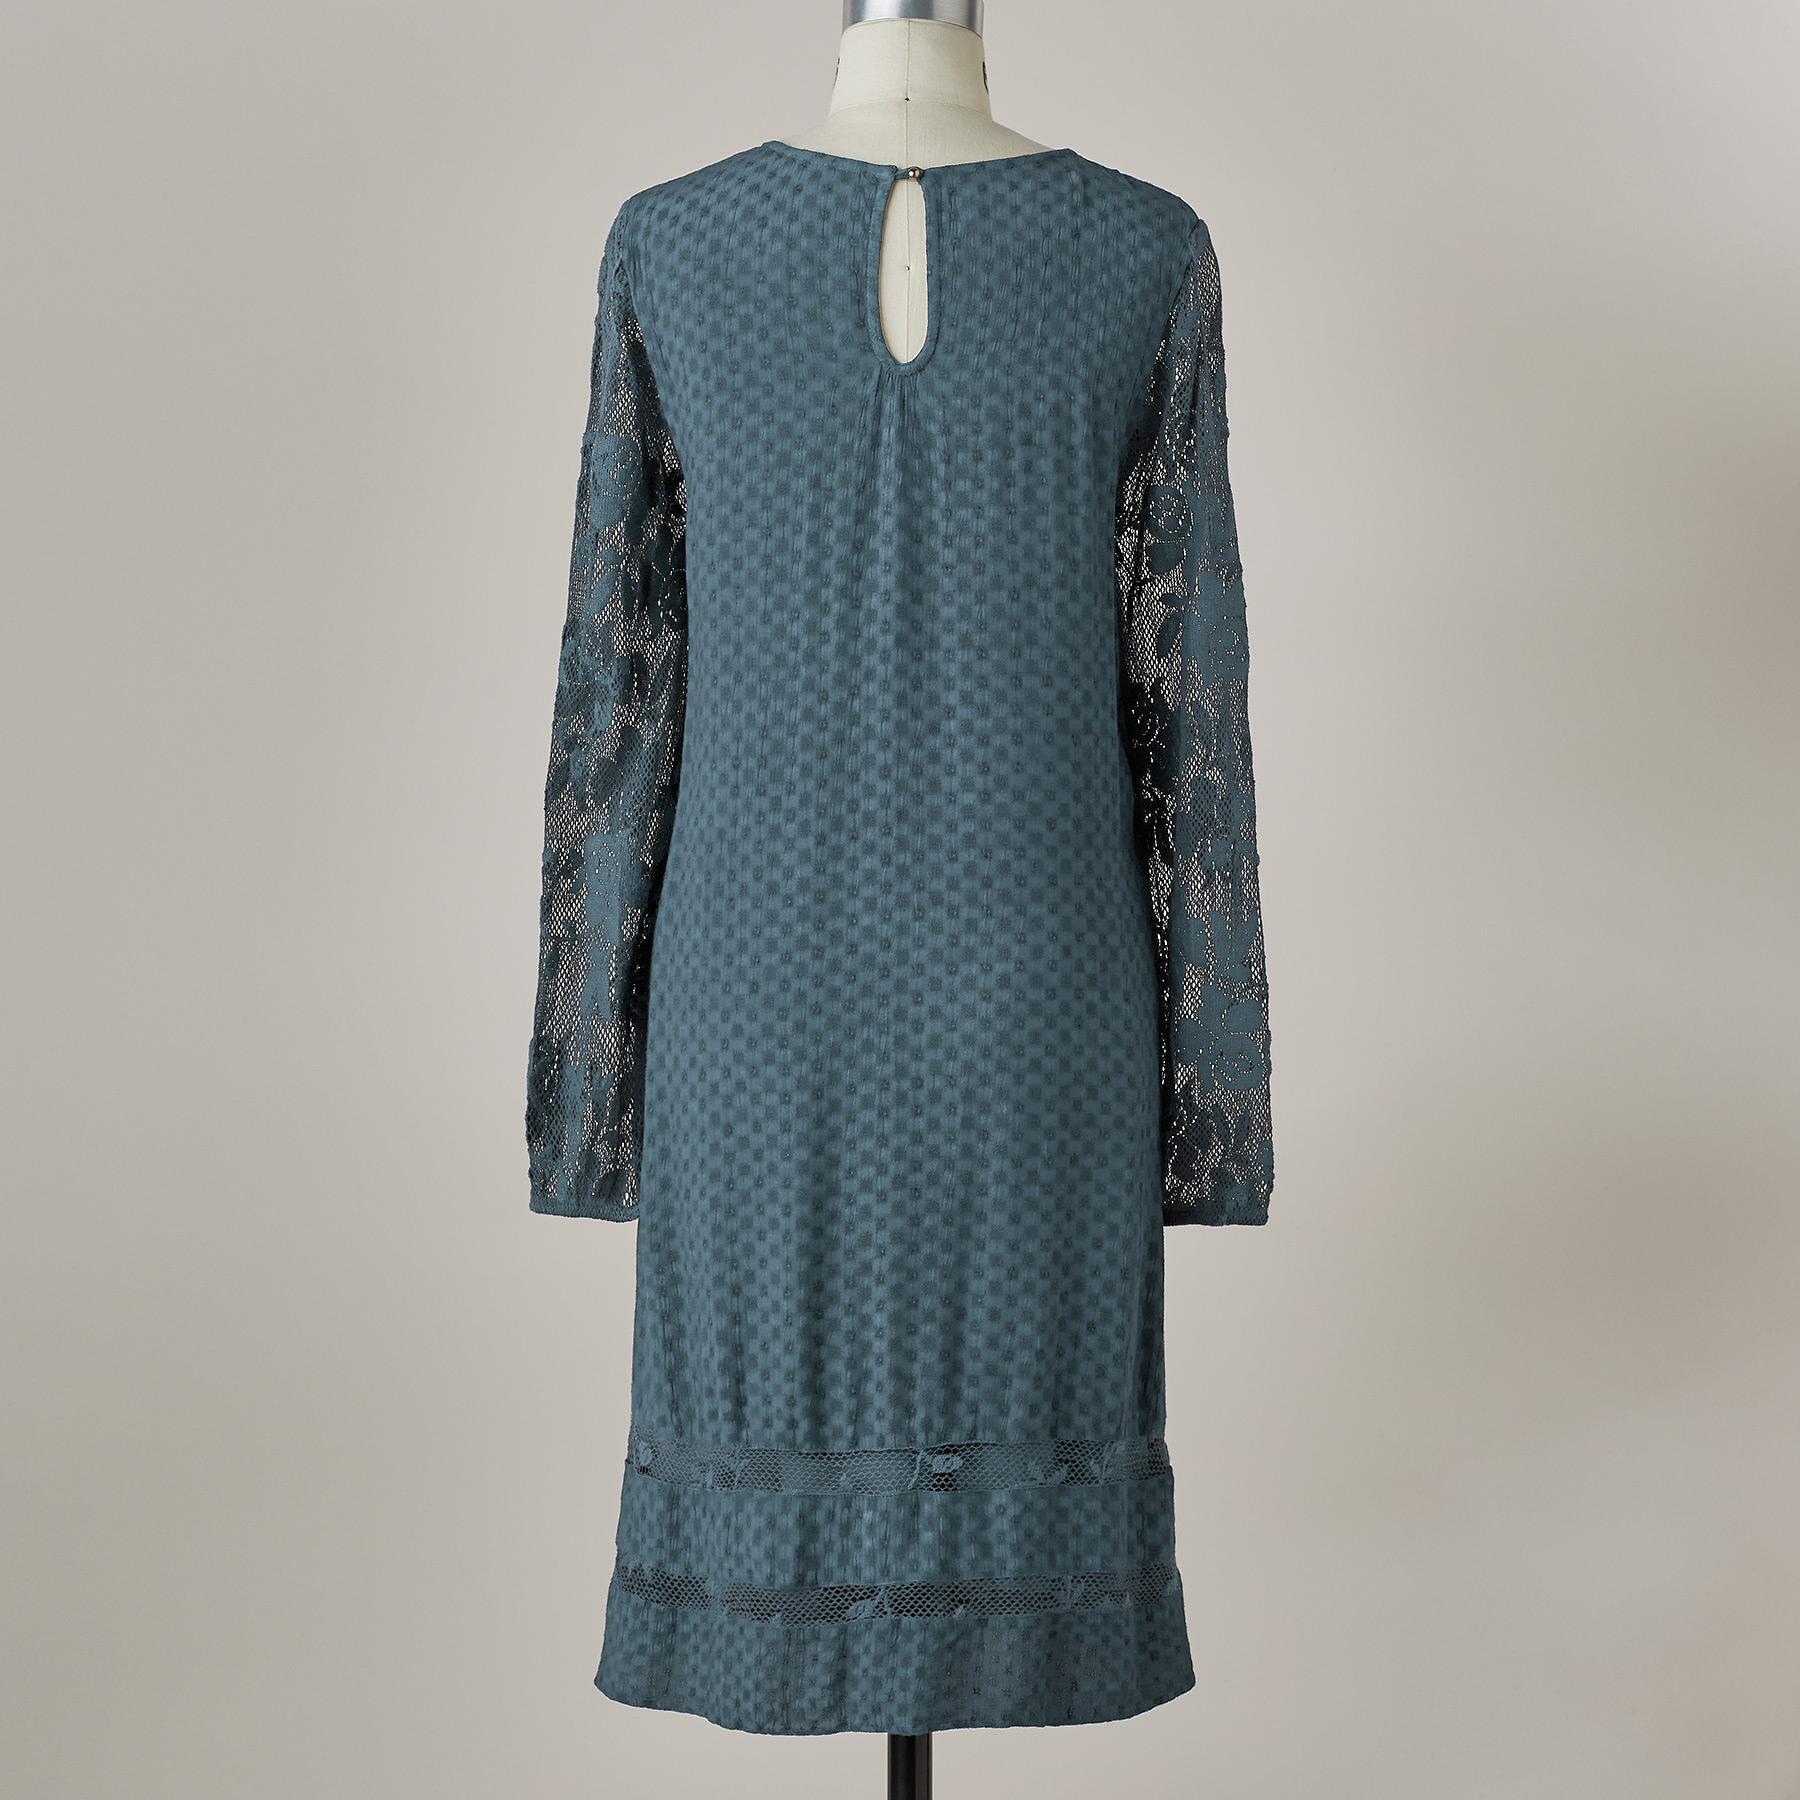 LORRAINE DRESS - PETITES: View 3